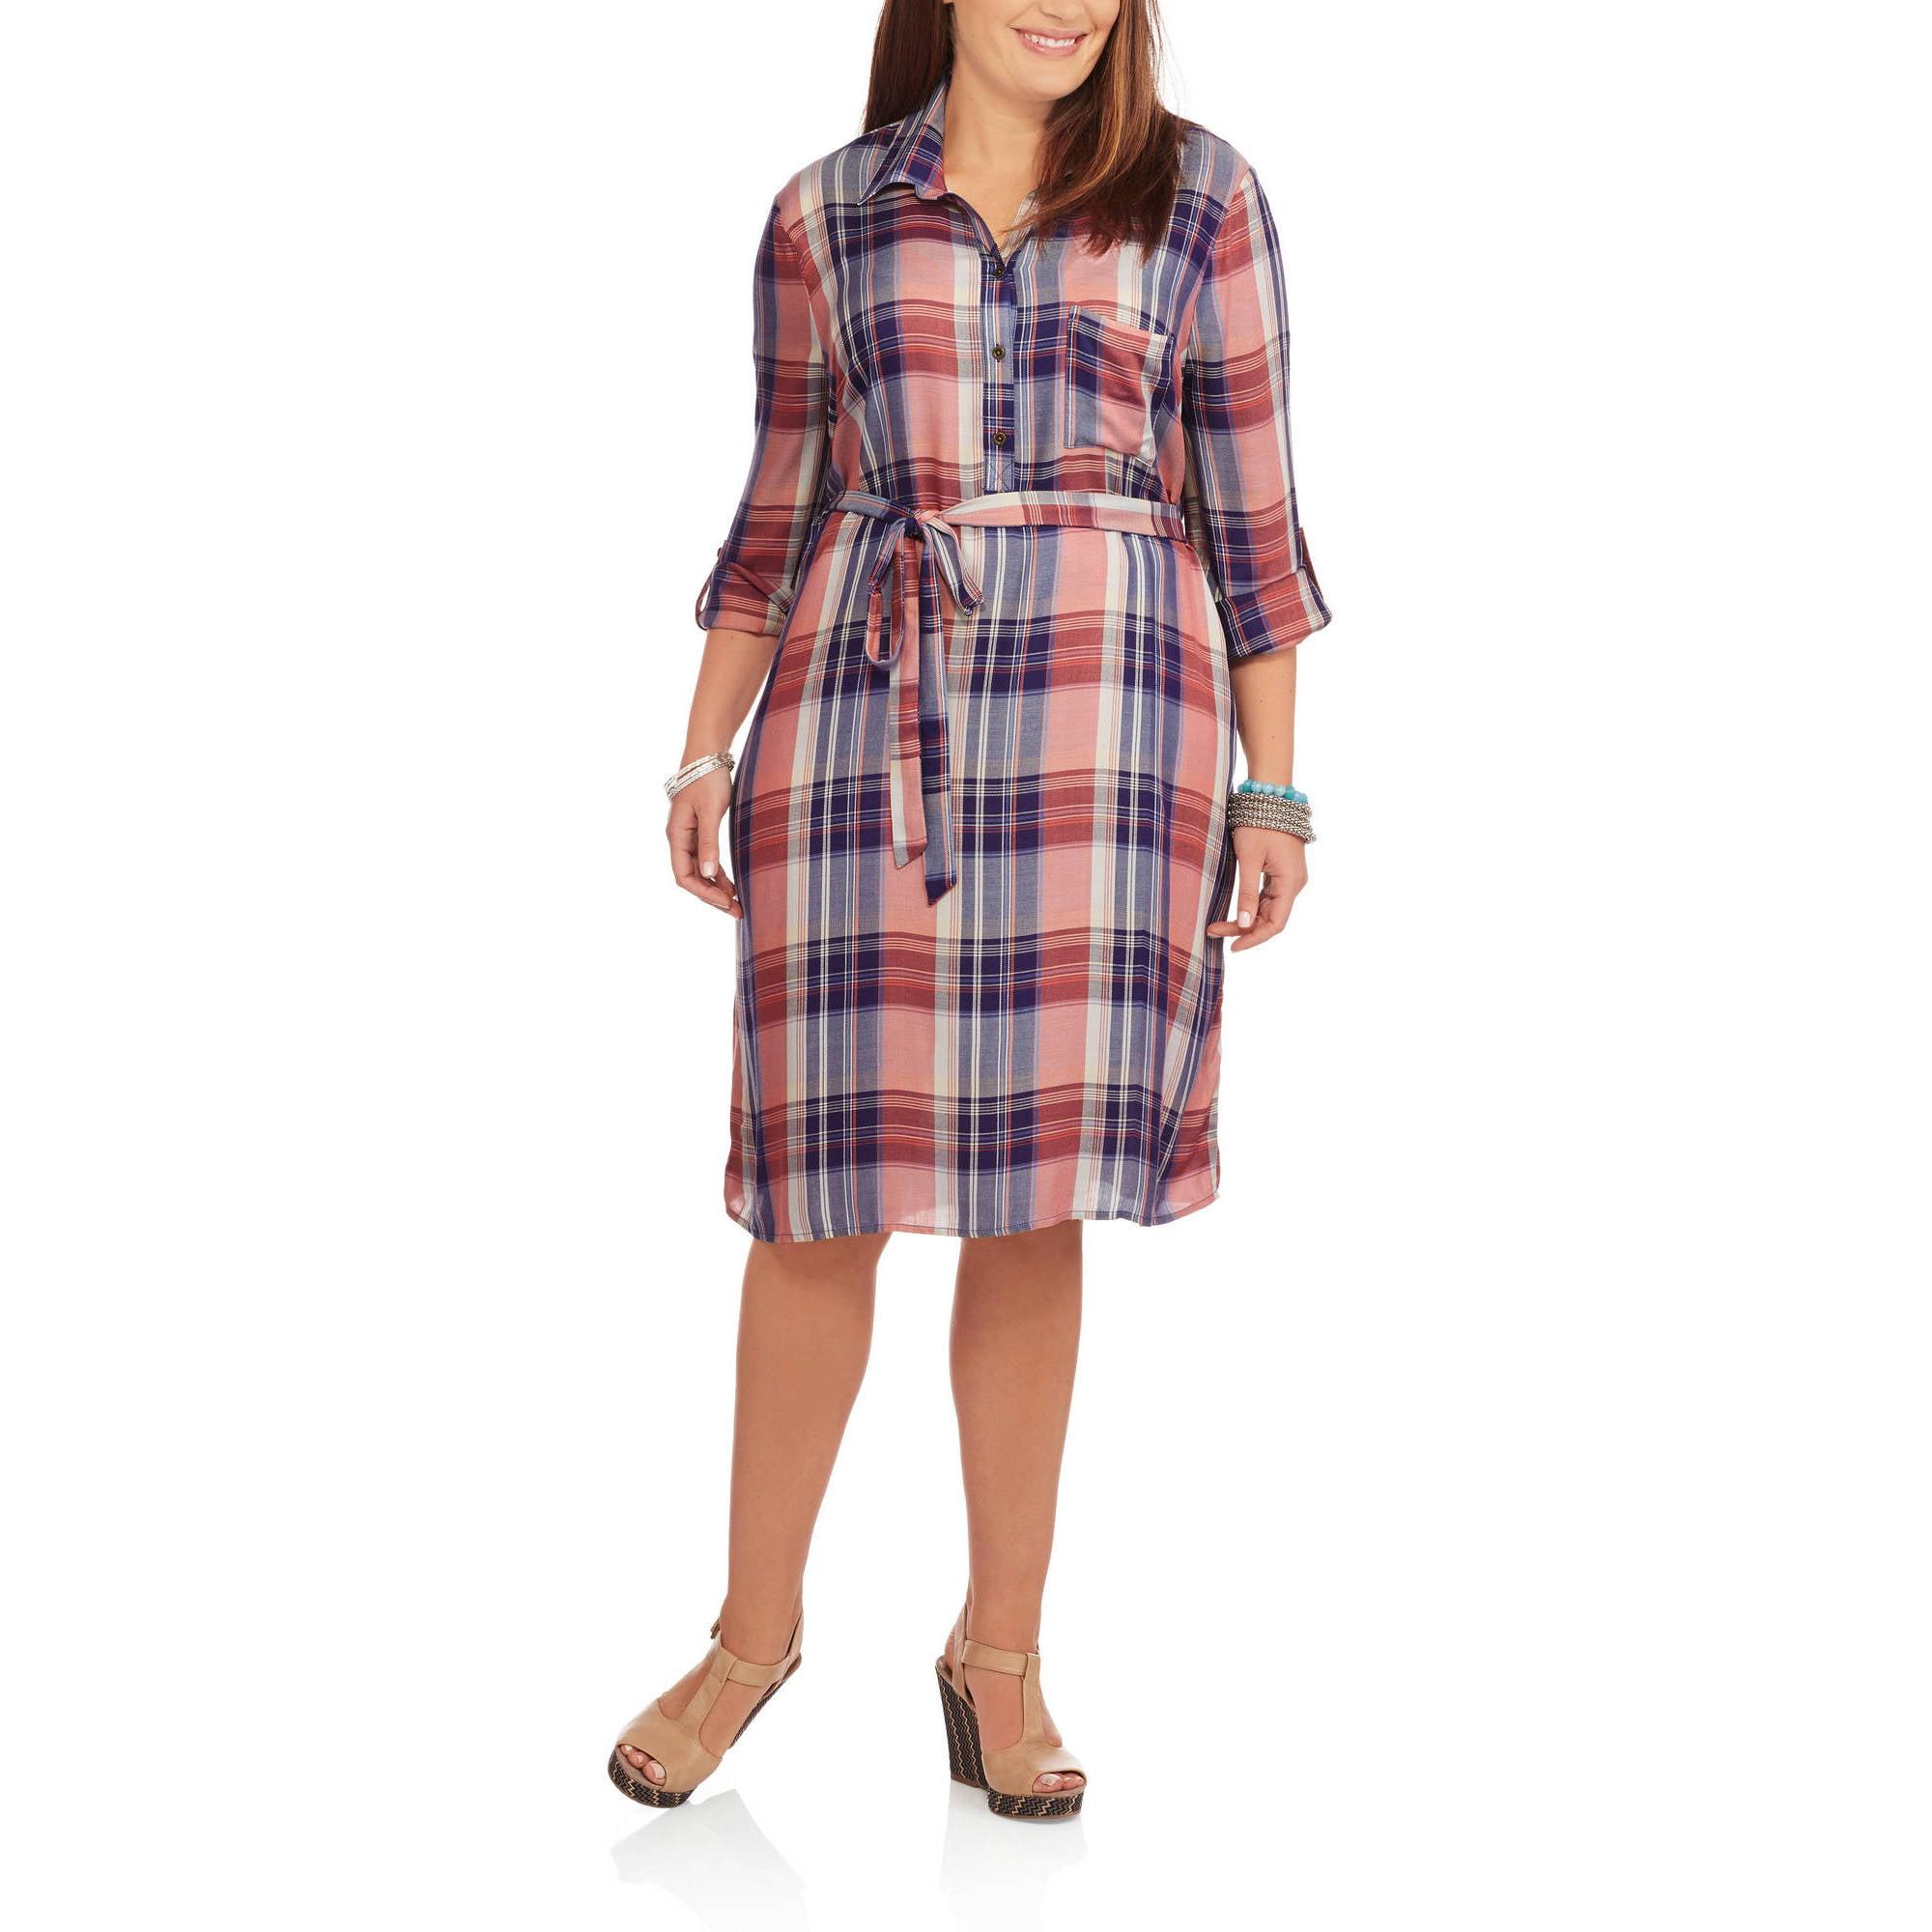 Faded Glory Women's Plus Plaid Shirt Dress